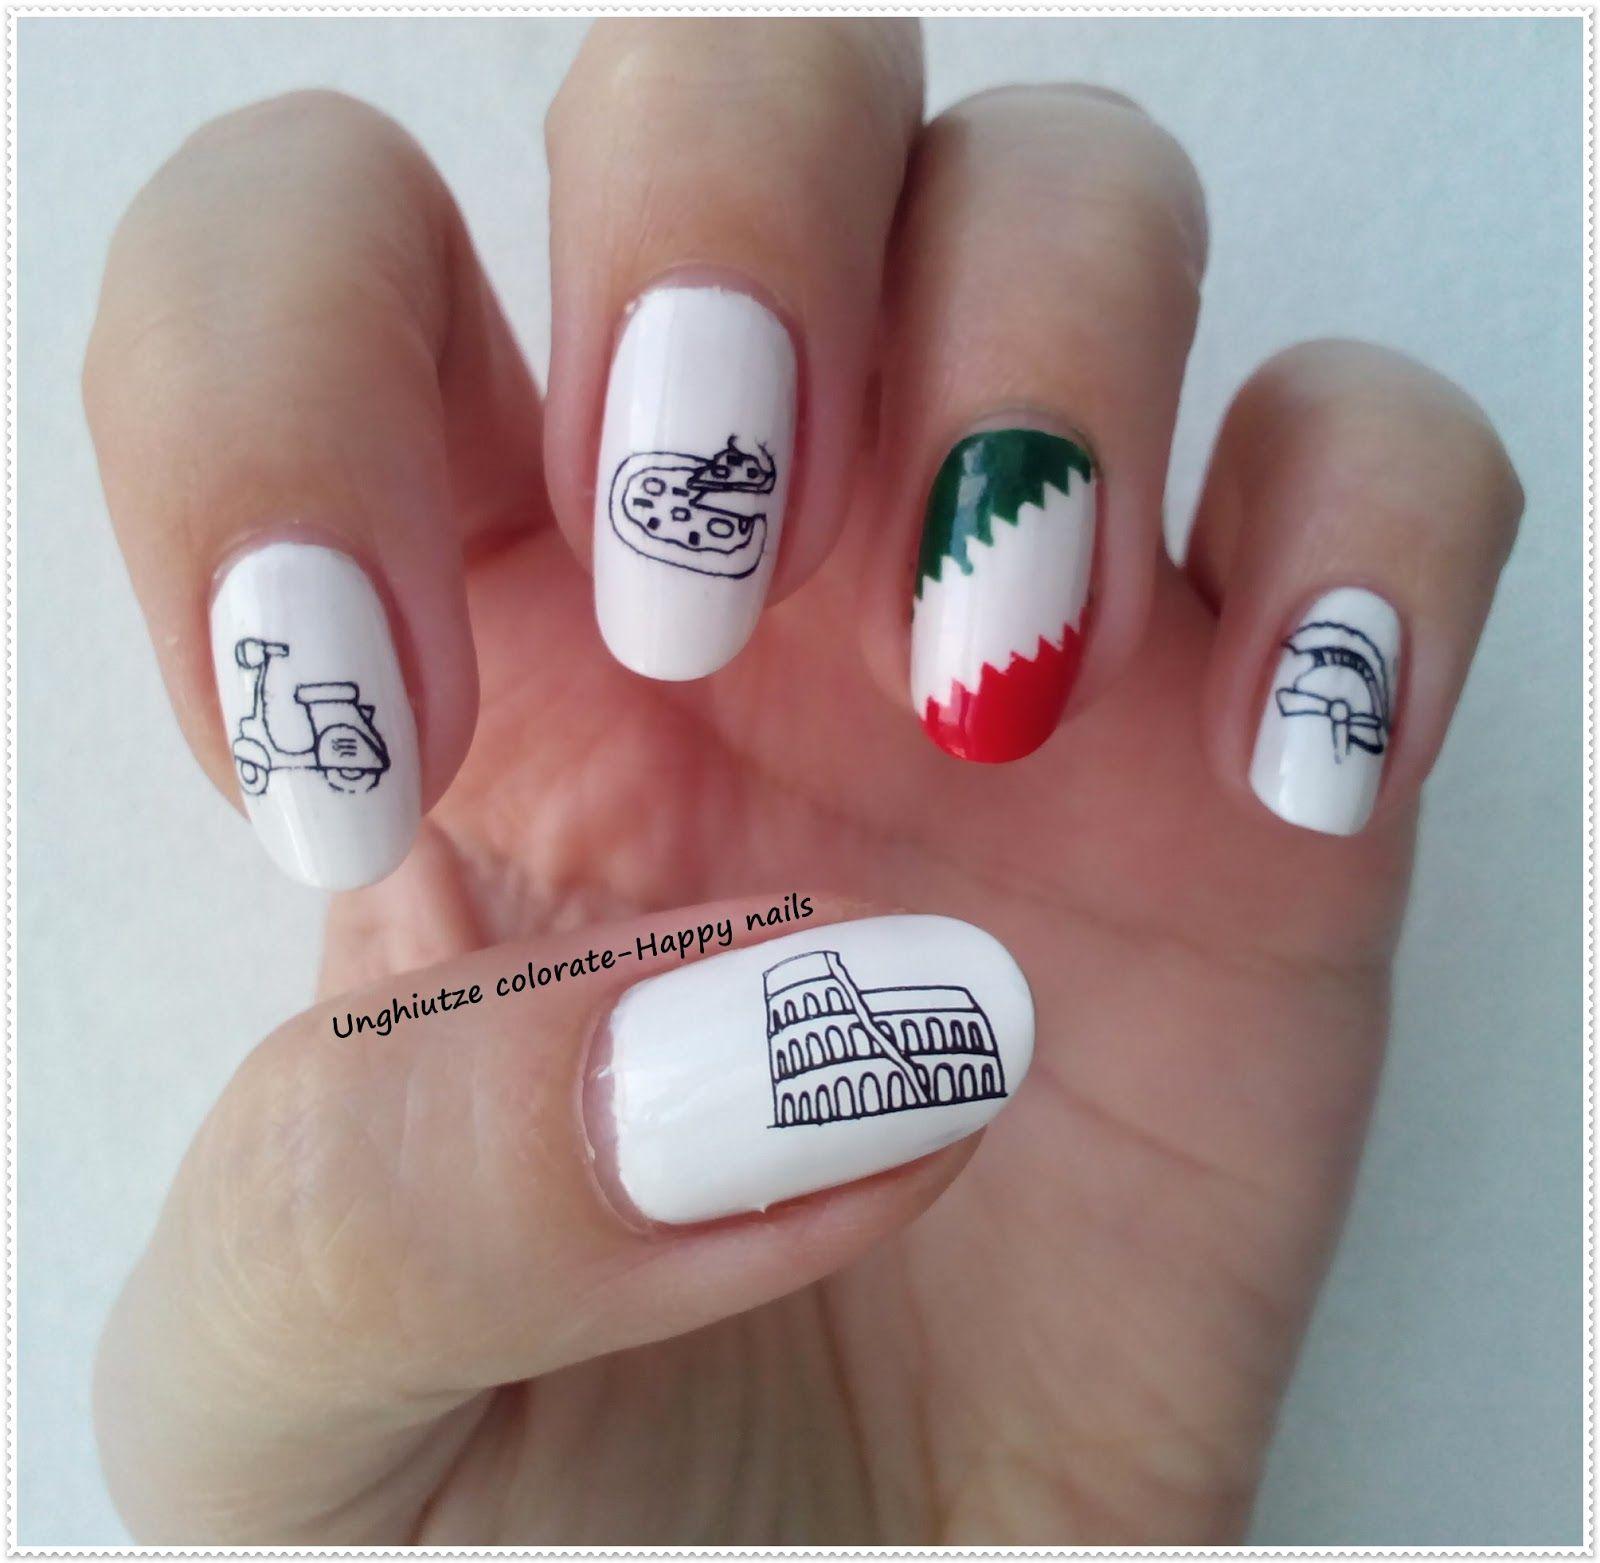 Unghiutze colorate-Happy nails: Alphabet nail art challenge - Letter I #nailart #nails #mani